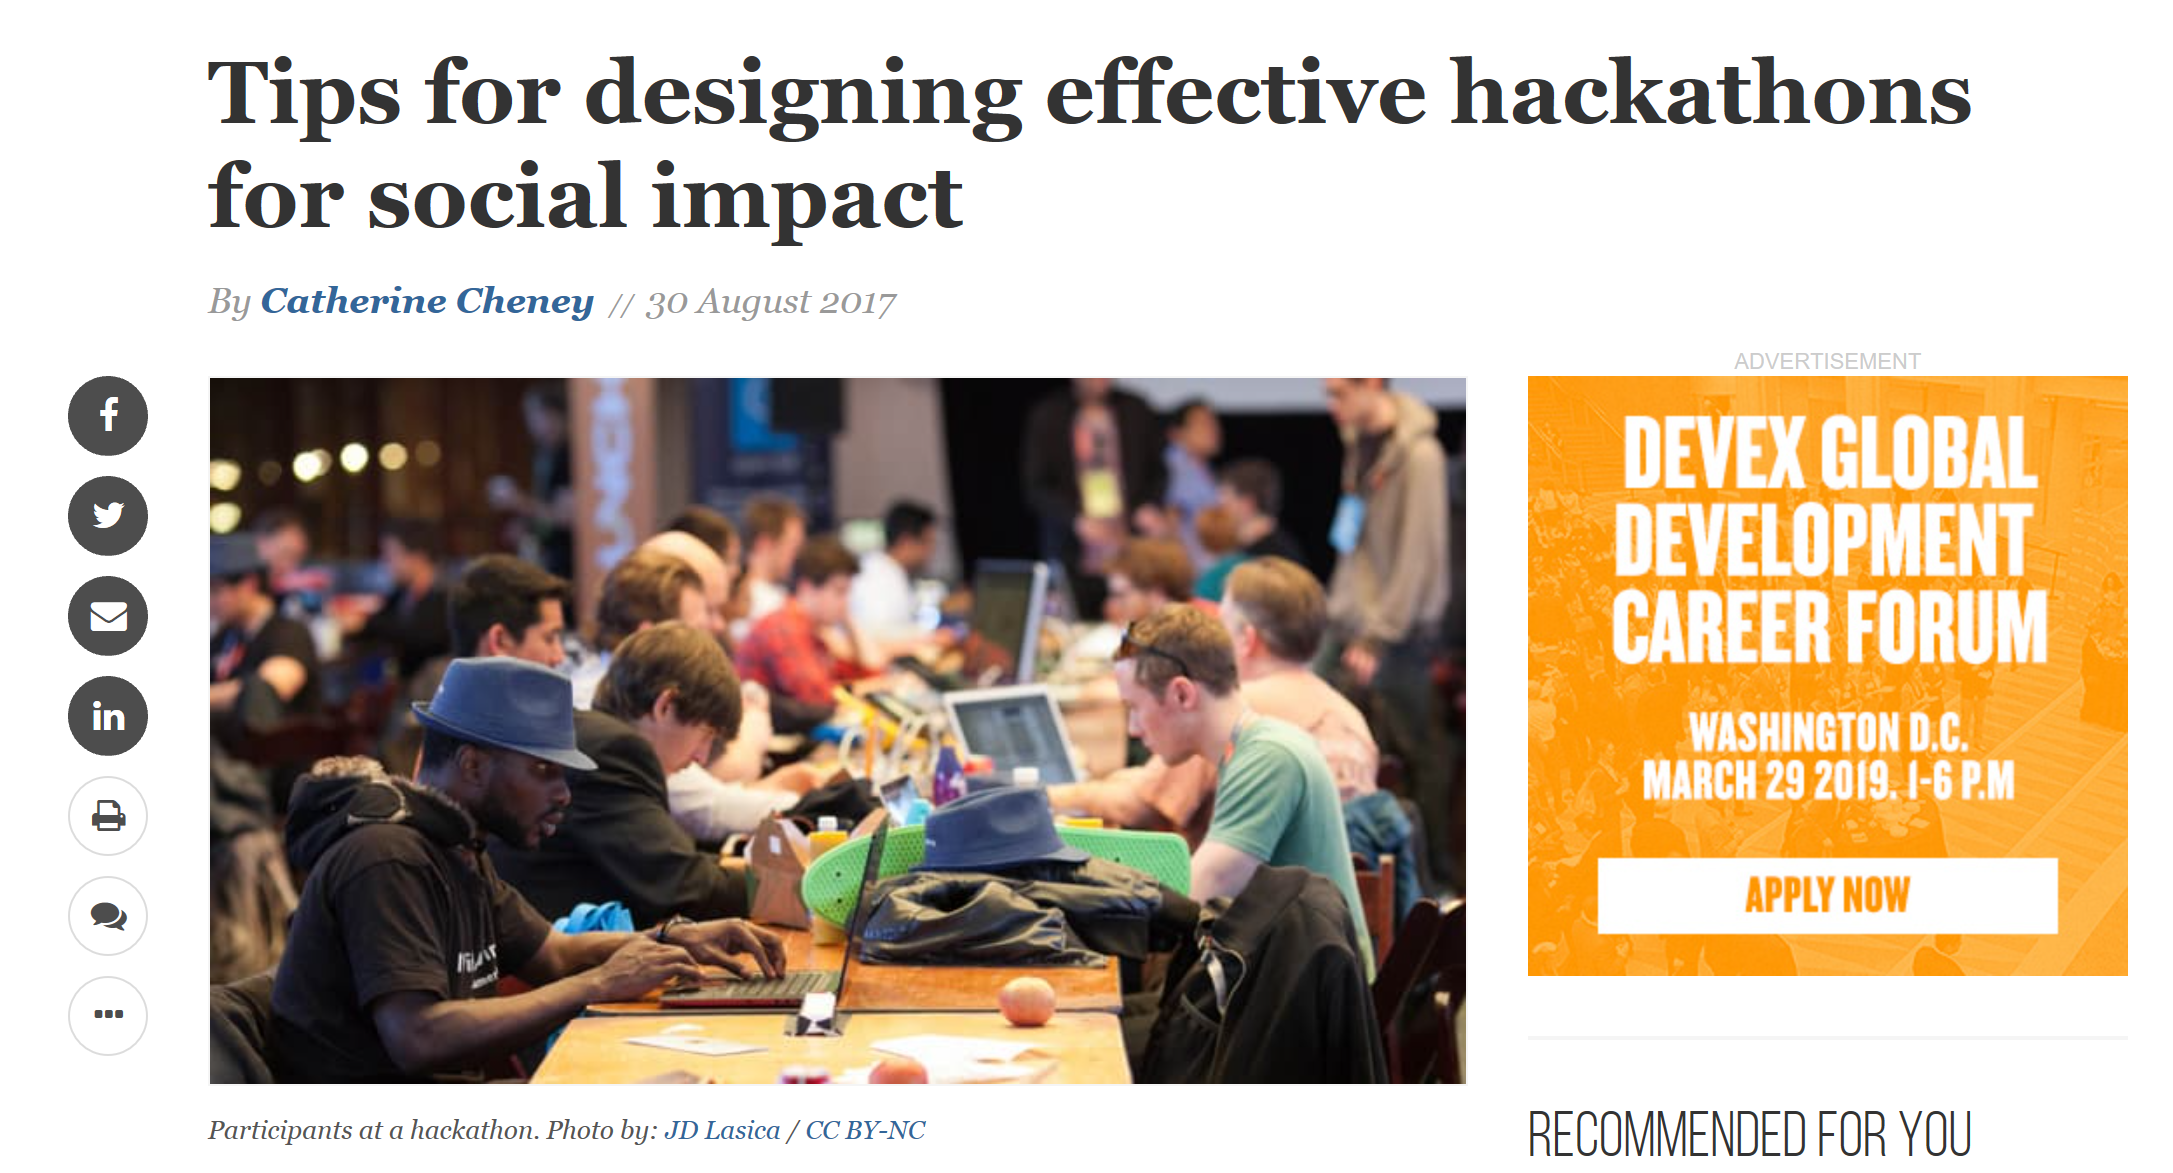 HackathonForSocialImpact